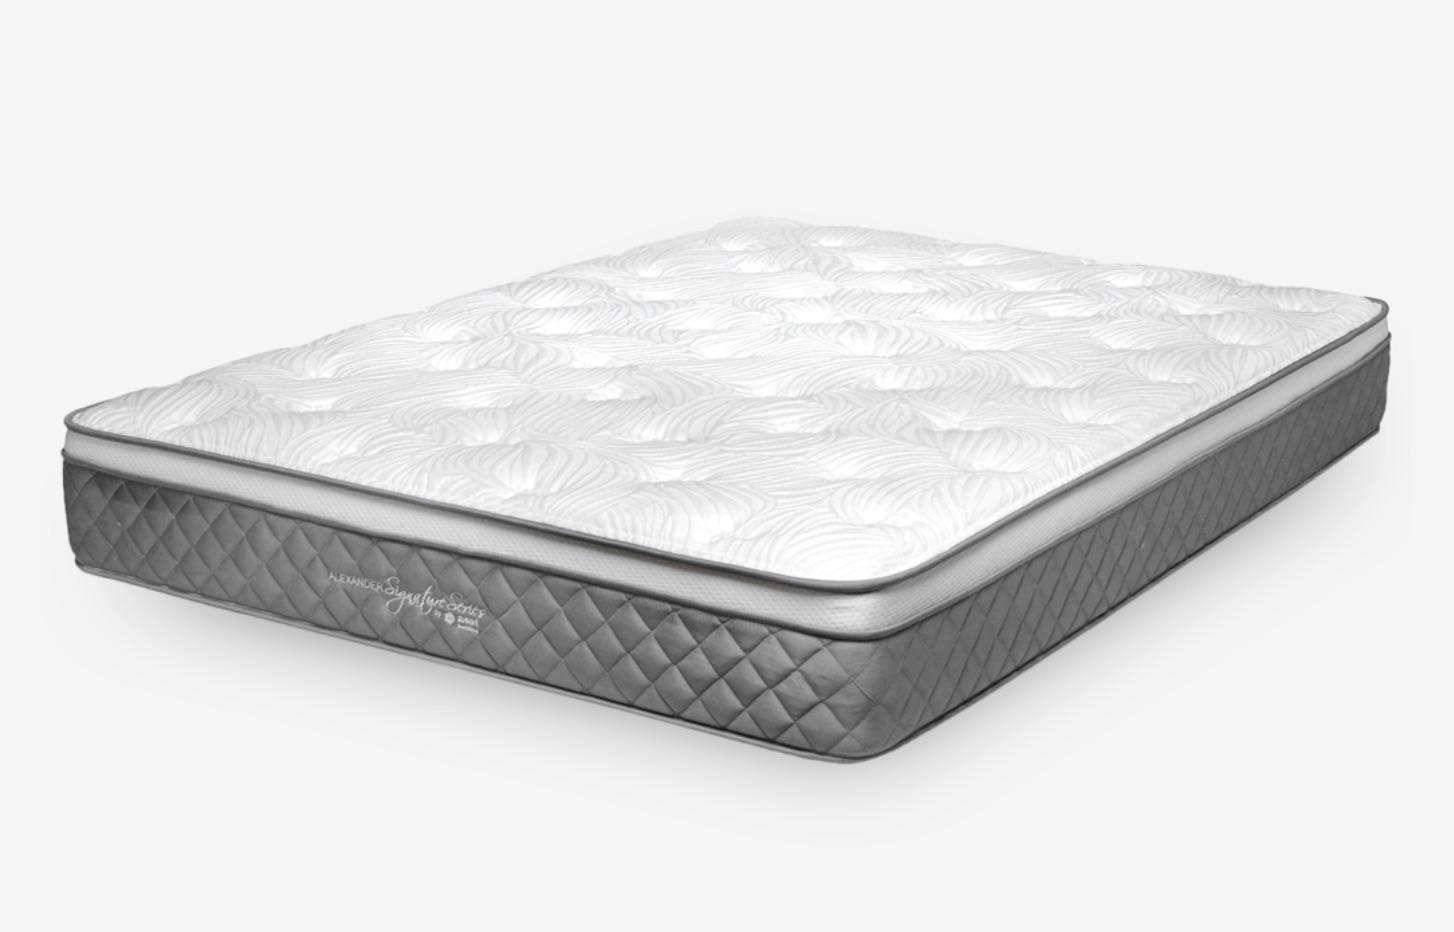 nest bedding alexander signature series mattress reviews With alexander signature series mattress